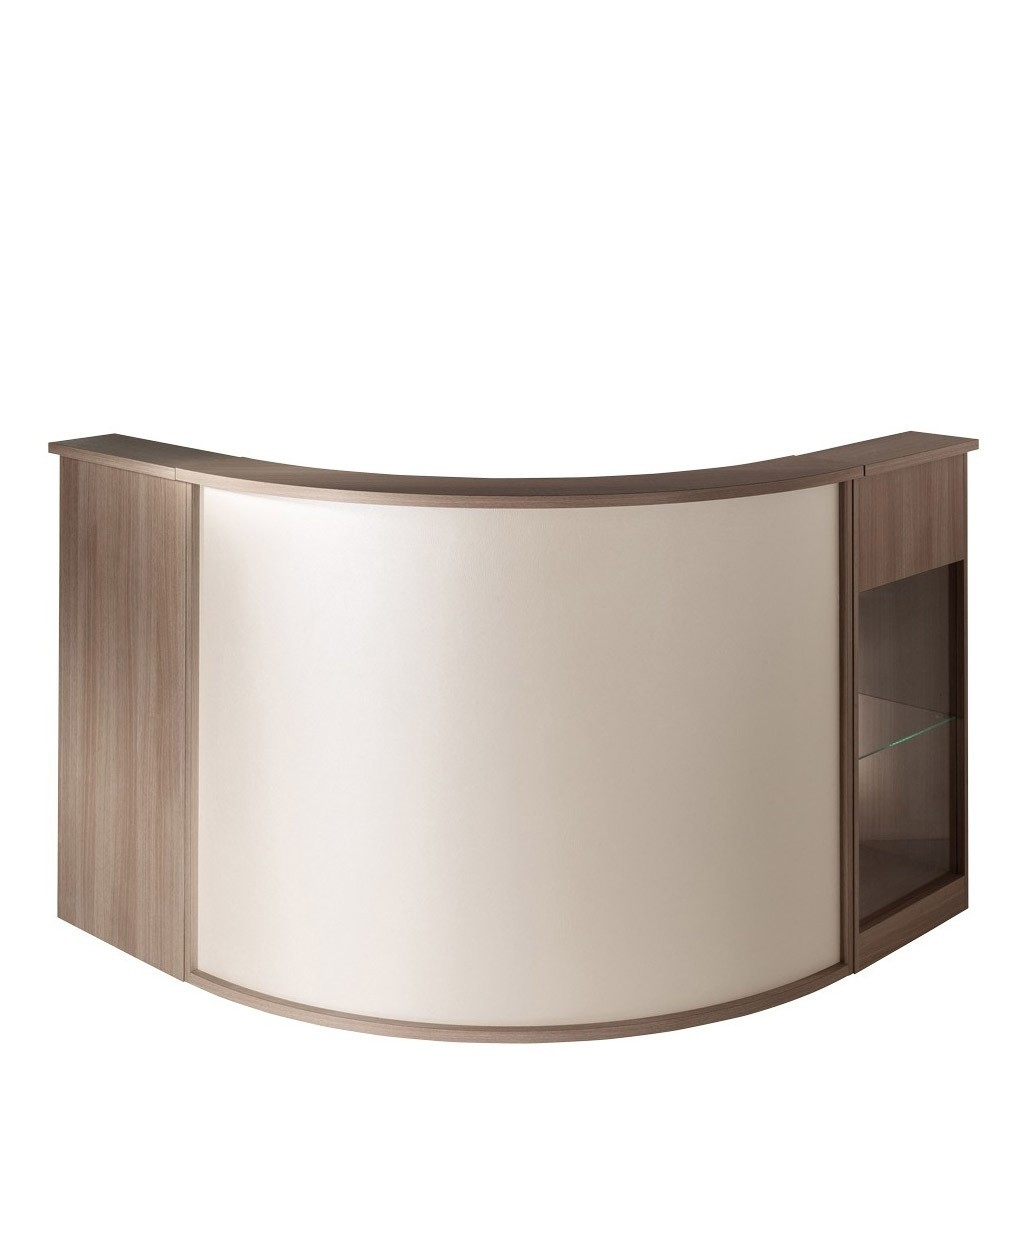 Salon Reception Desks Curved Corner Circular Glass Top Desks